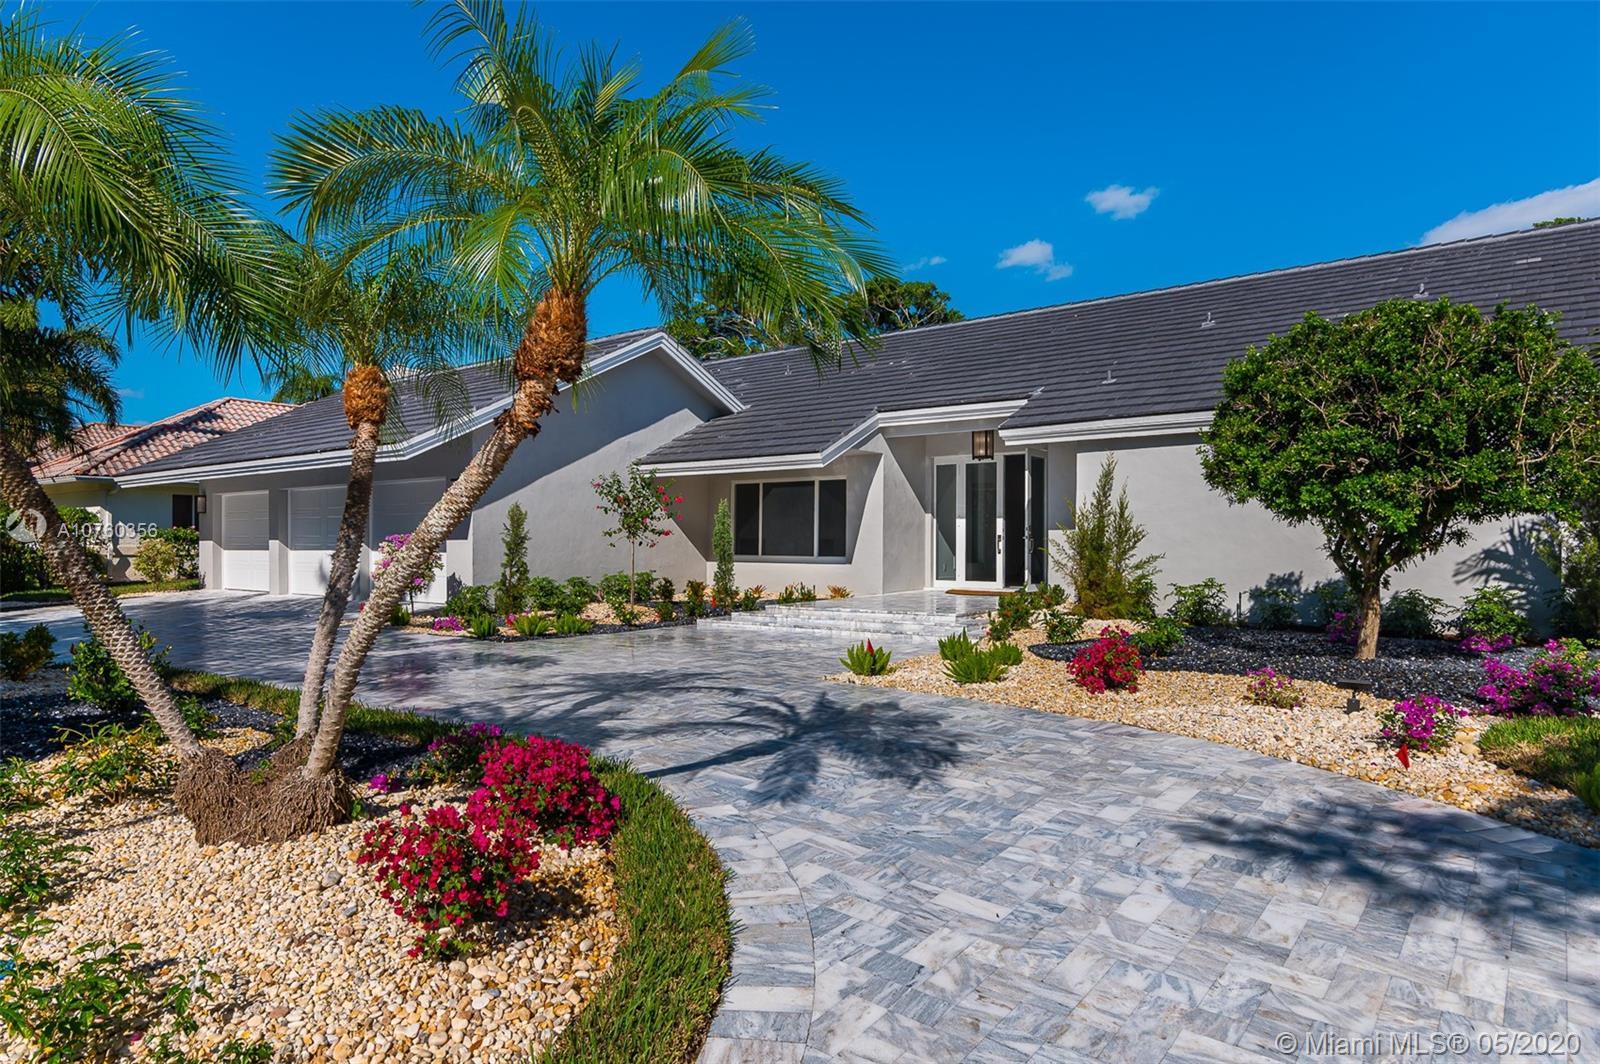 575 Sandpiper Way Property Photo - Boca Raton, FL real estate listing